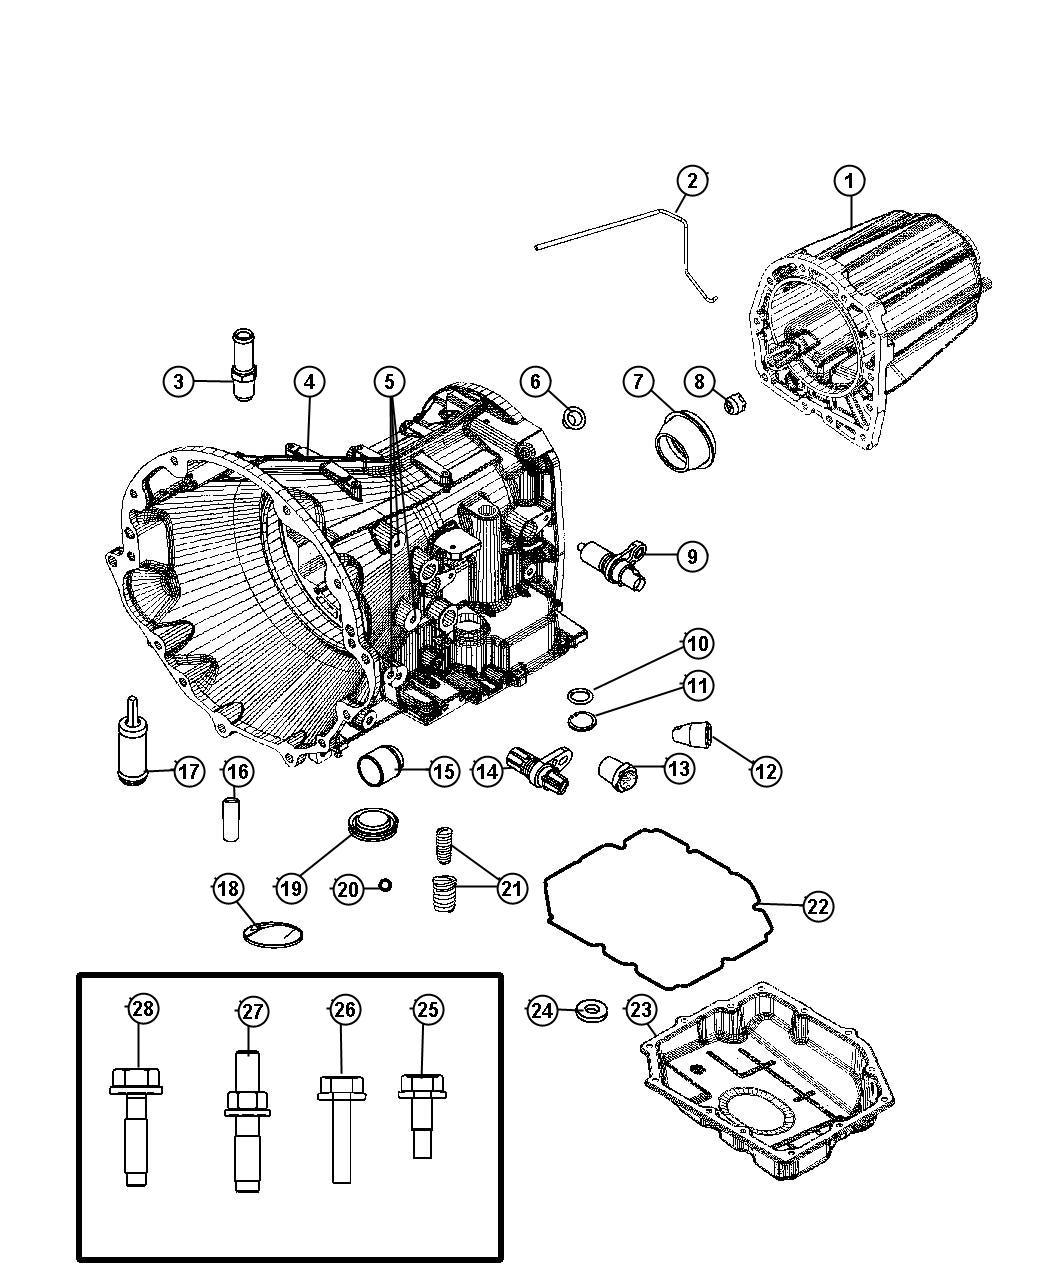 Dodge Nitro Pan Transmission Oil Filters